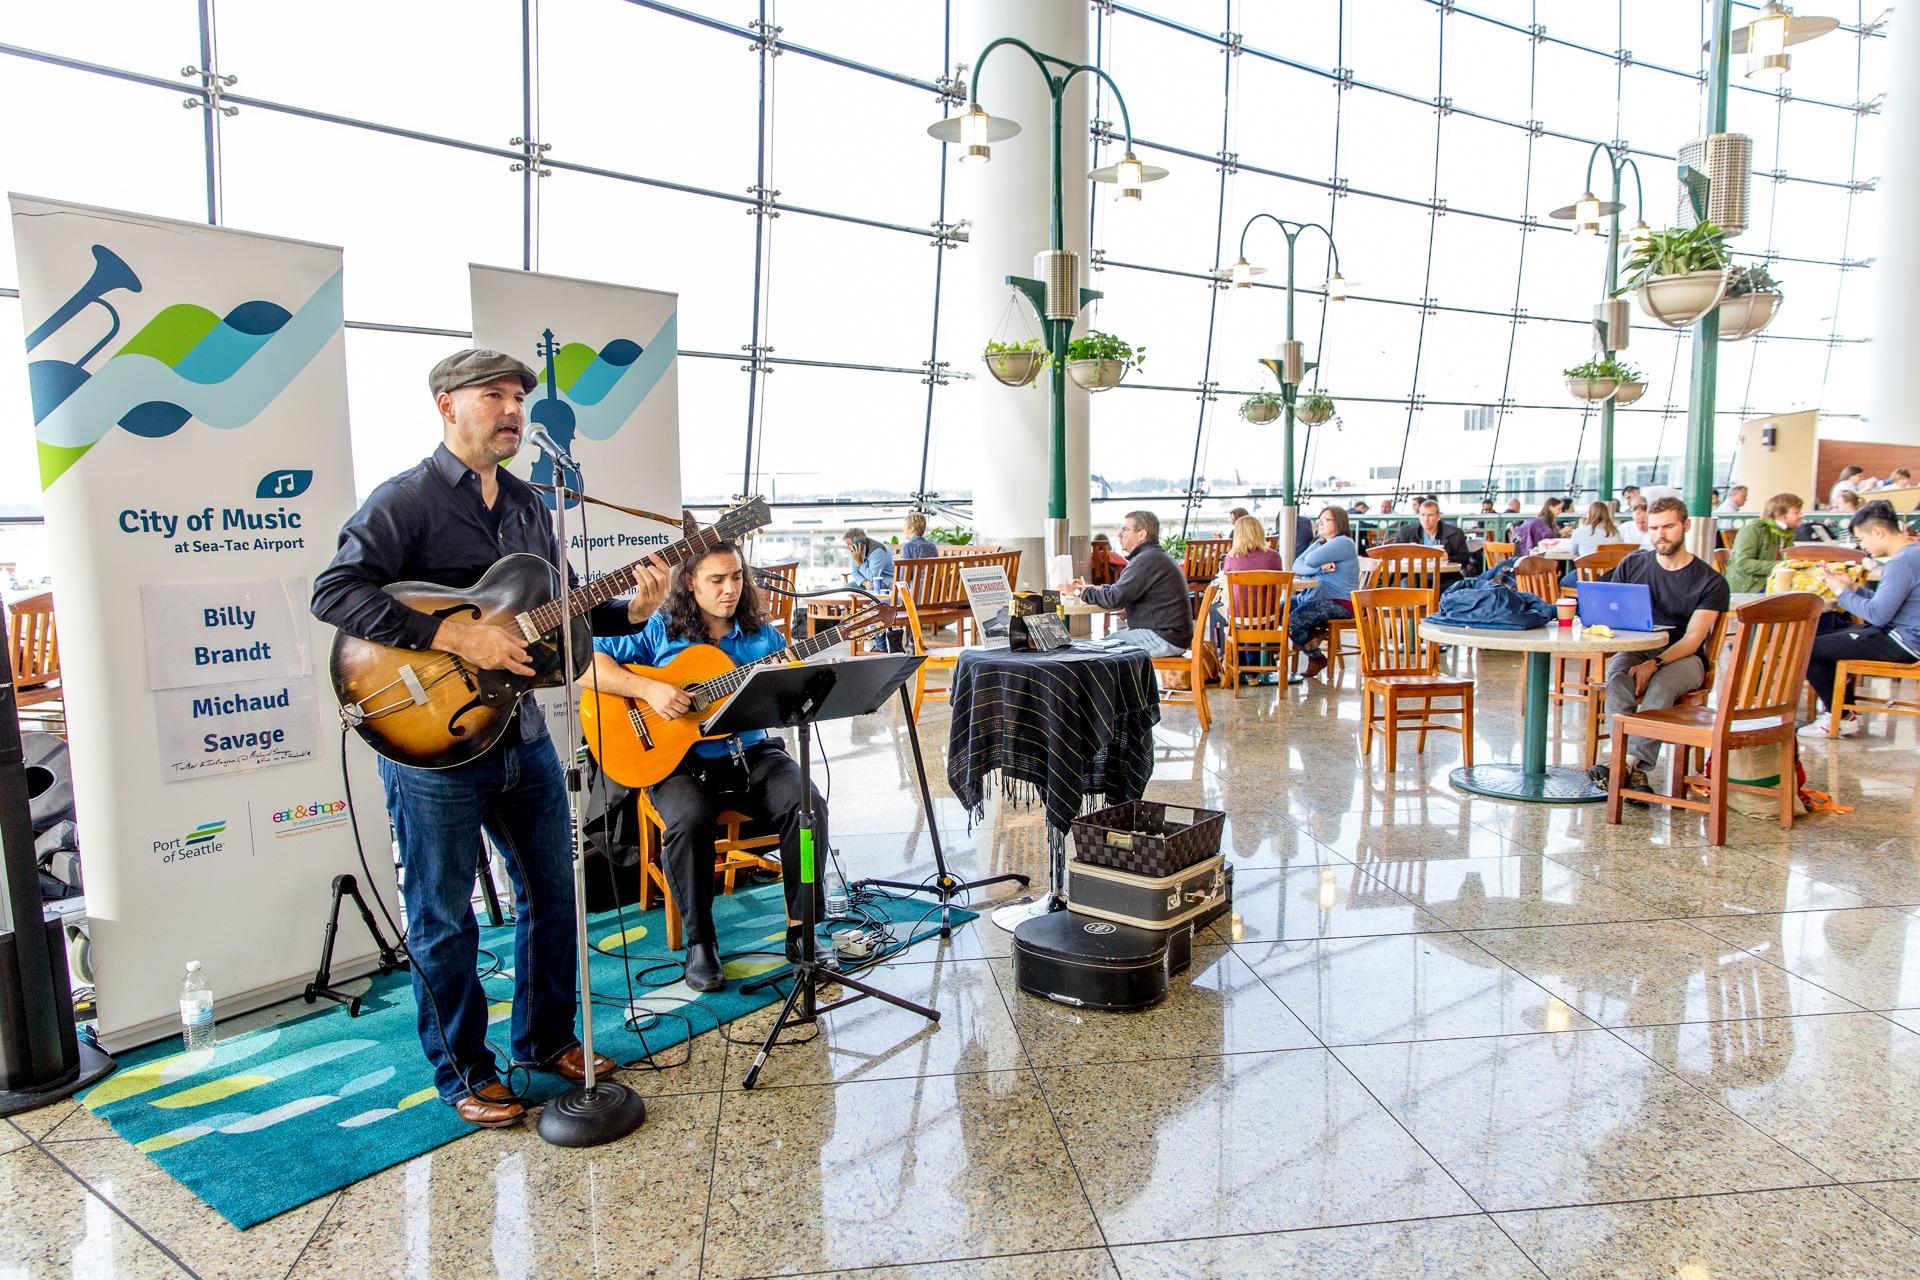 musicians perform at sea-tac airport